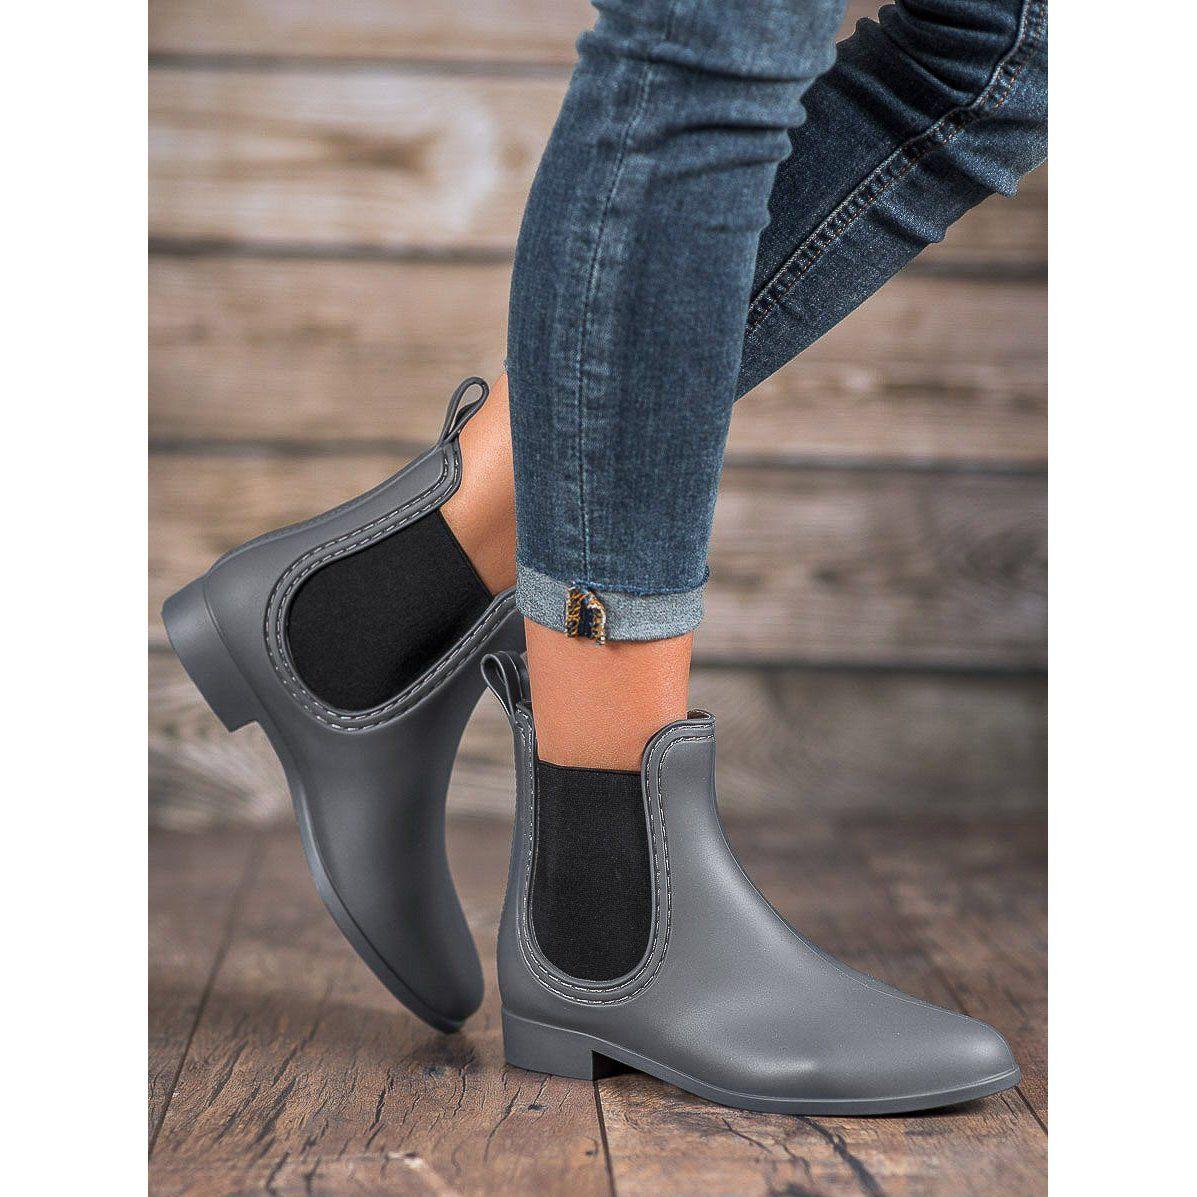 Kalosze Damskie Shelovet Shelovet Szare Wsuwane Kalosze Boots Women Shoes Rain Boots